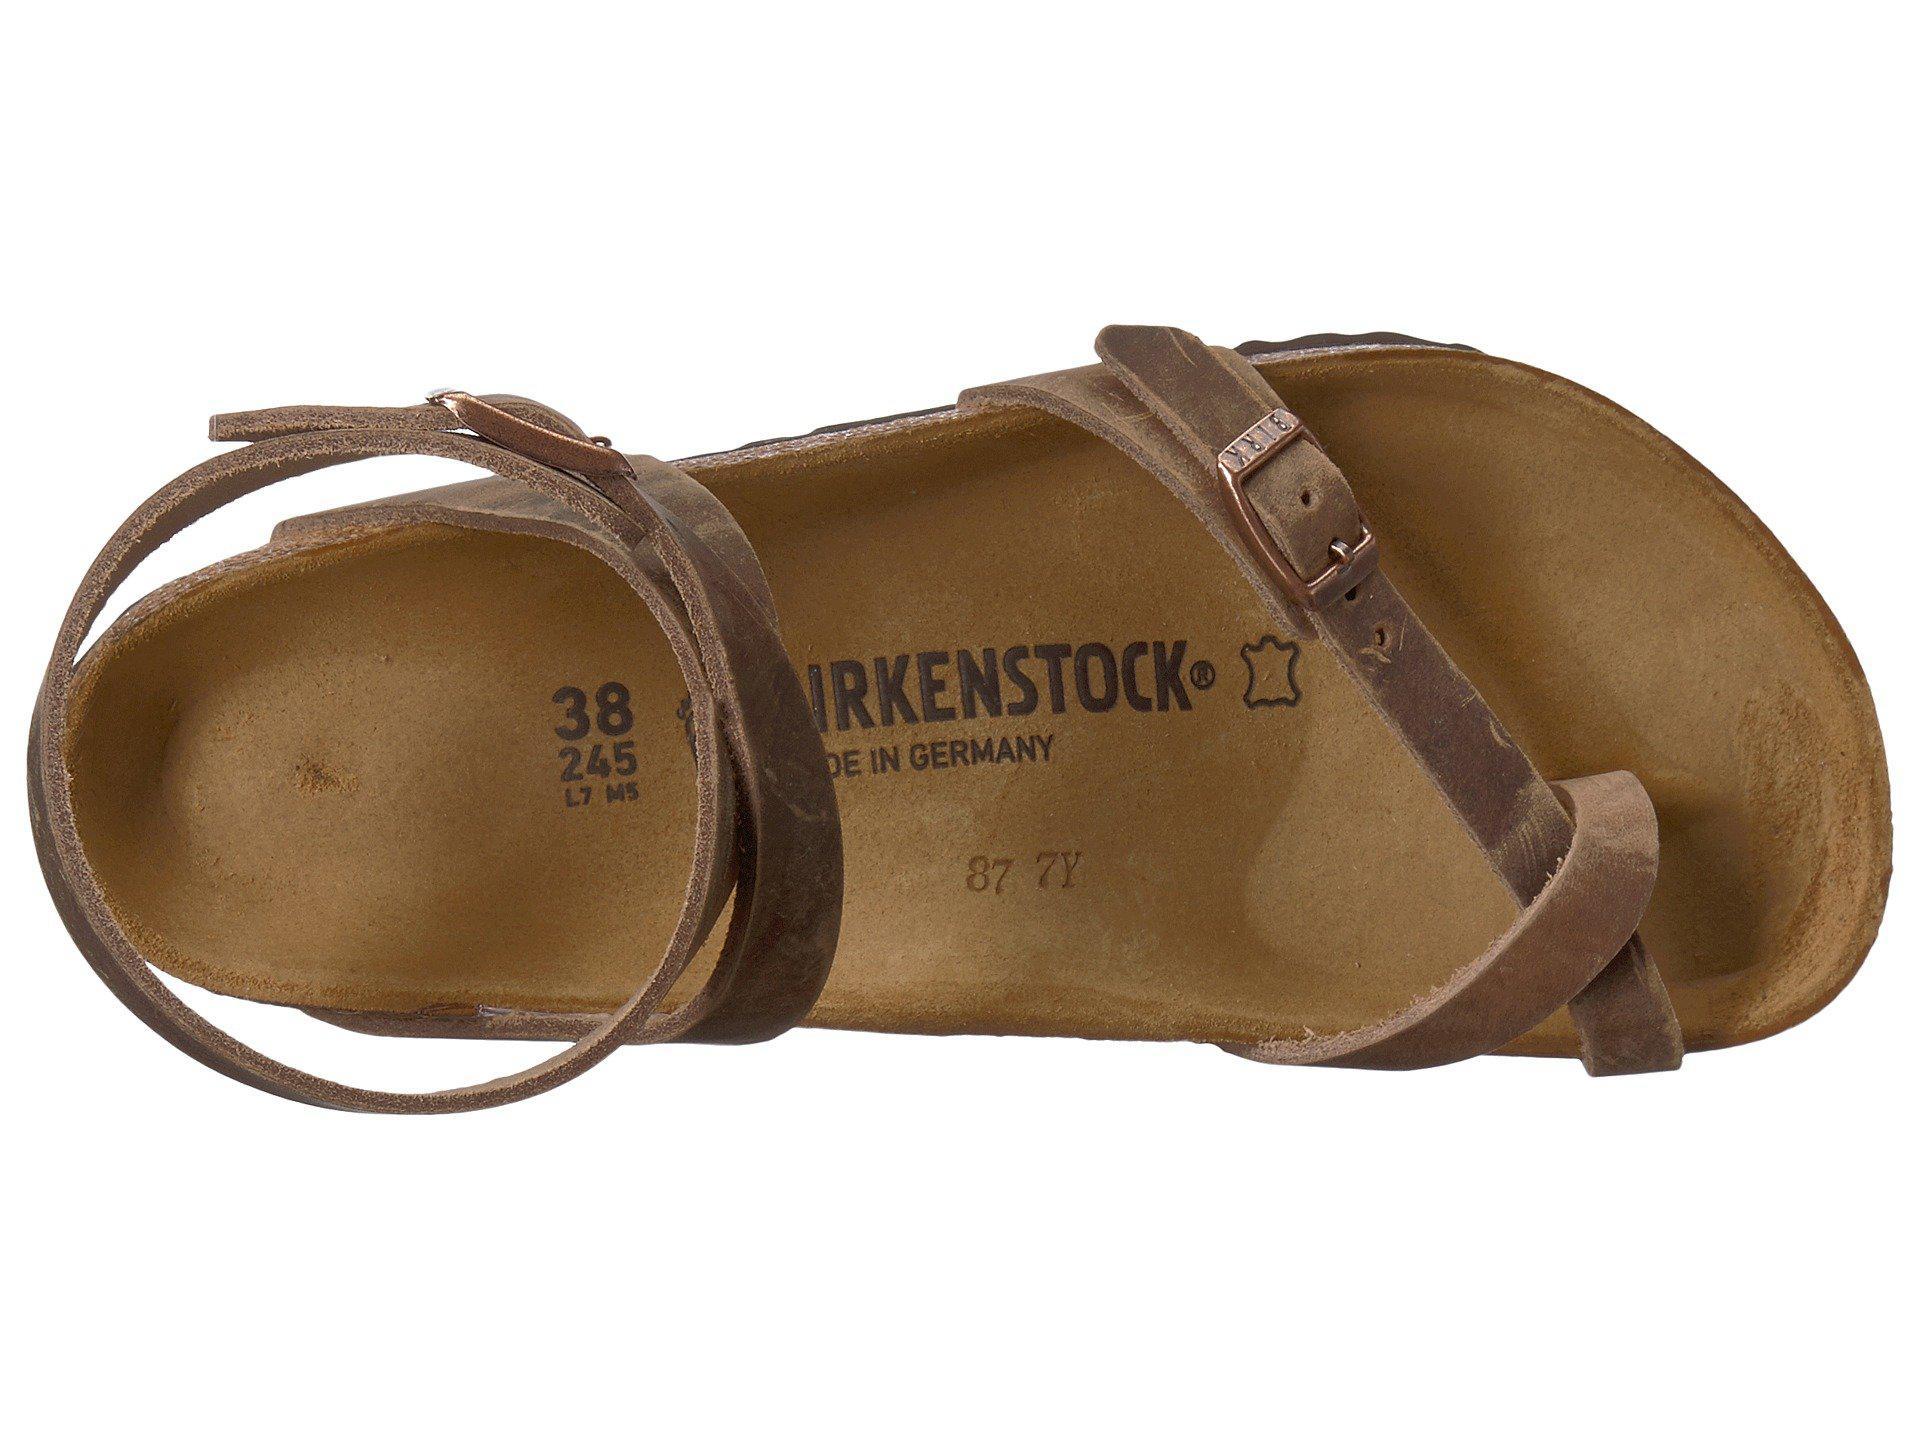 297b829e81814 Birkenstock - Brown Yara (habana Oiled Leather) Women s Sandals - Lyst.  View fullscreen